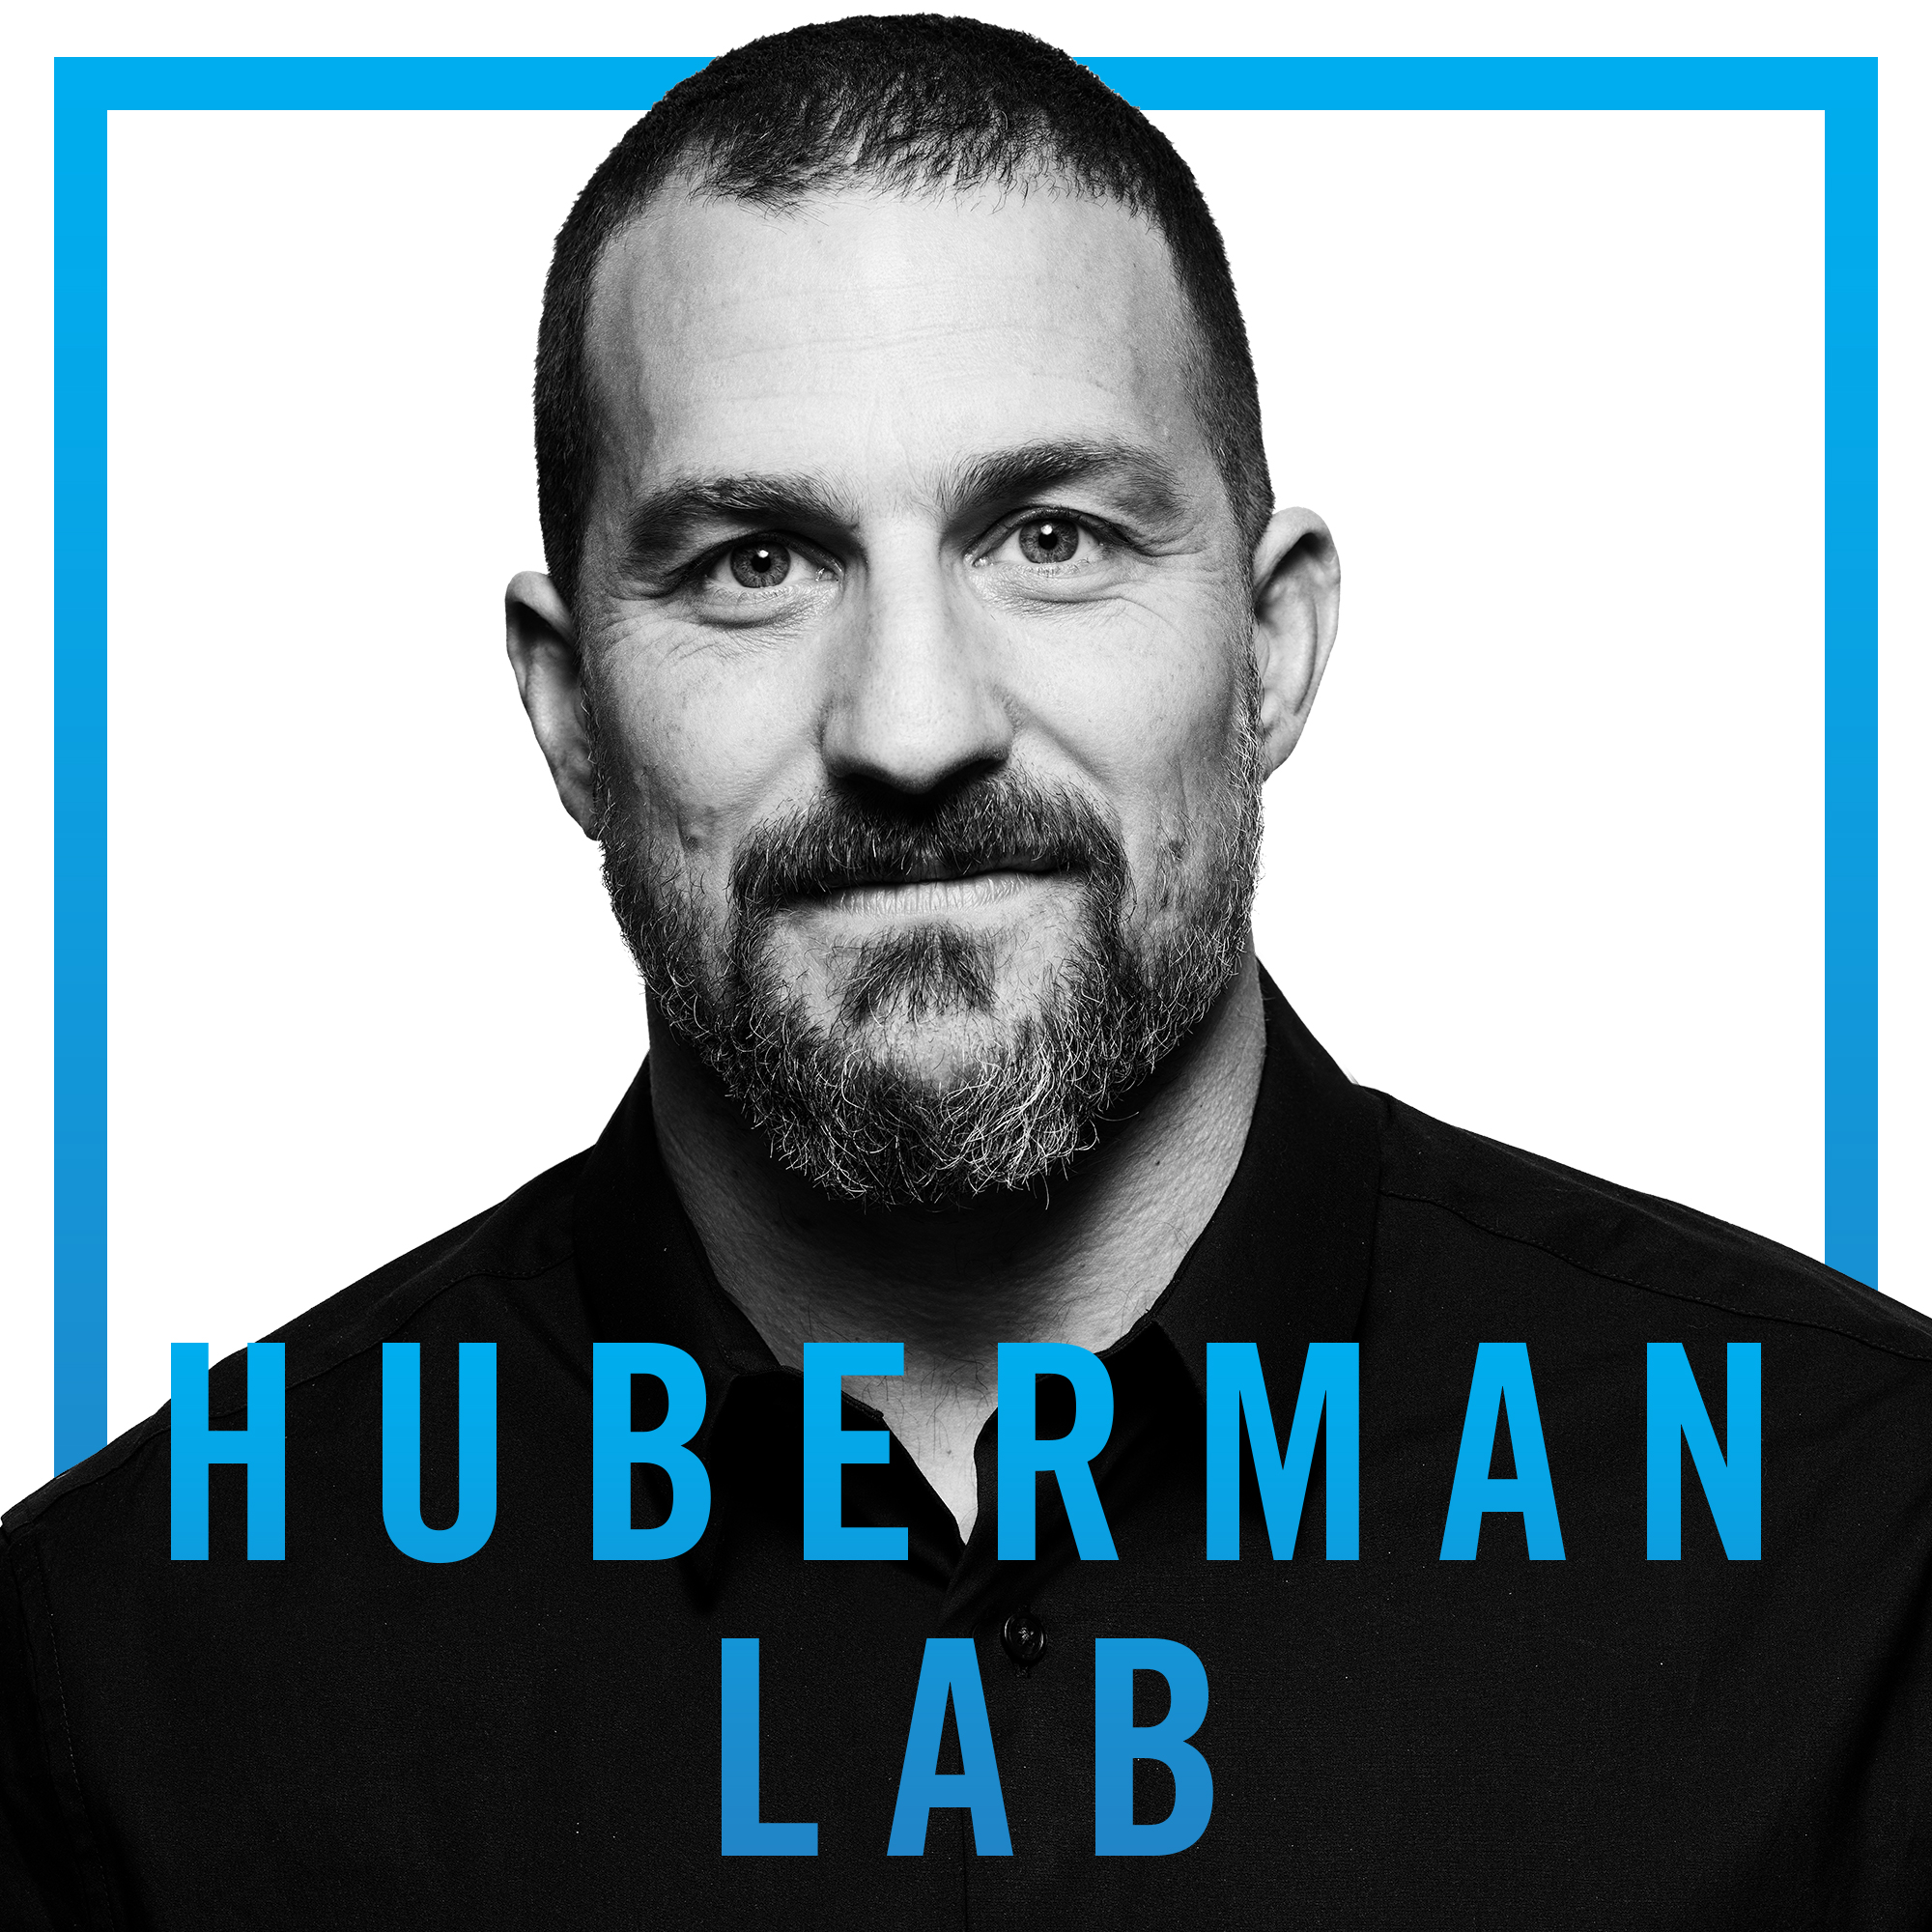 huberman lab podcast